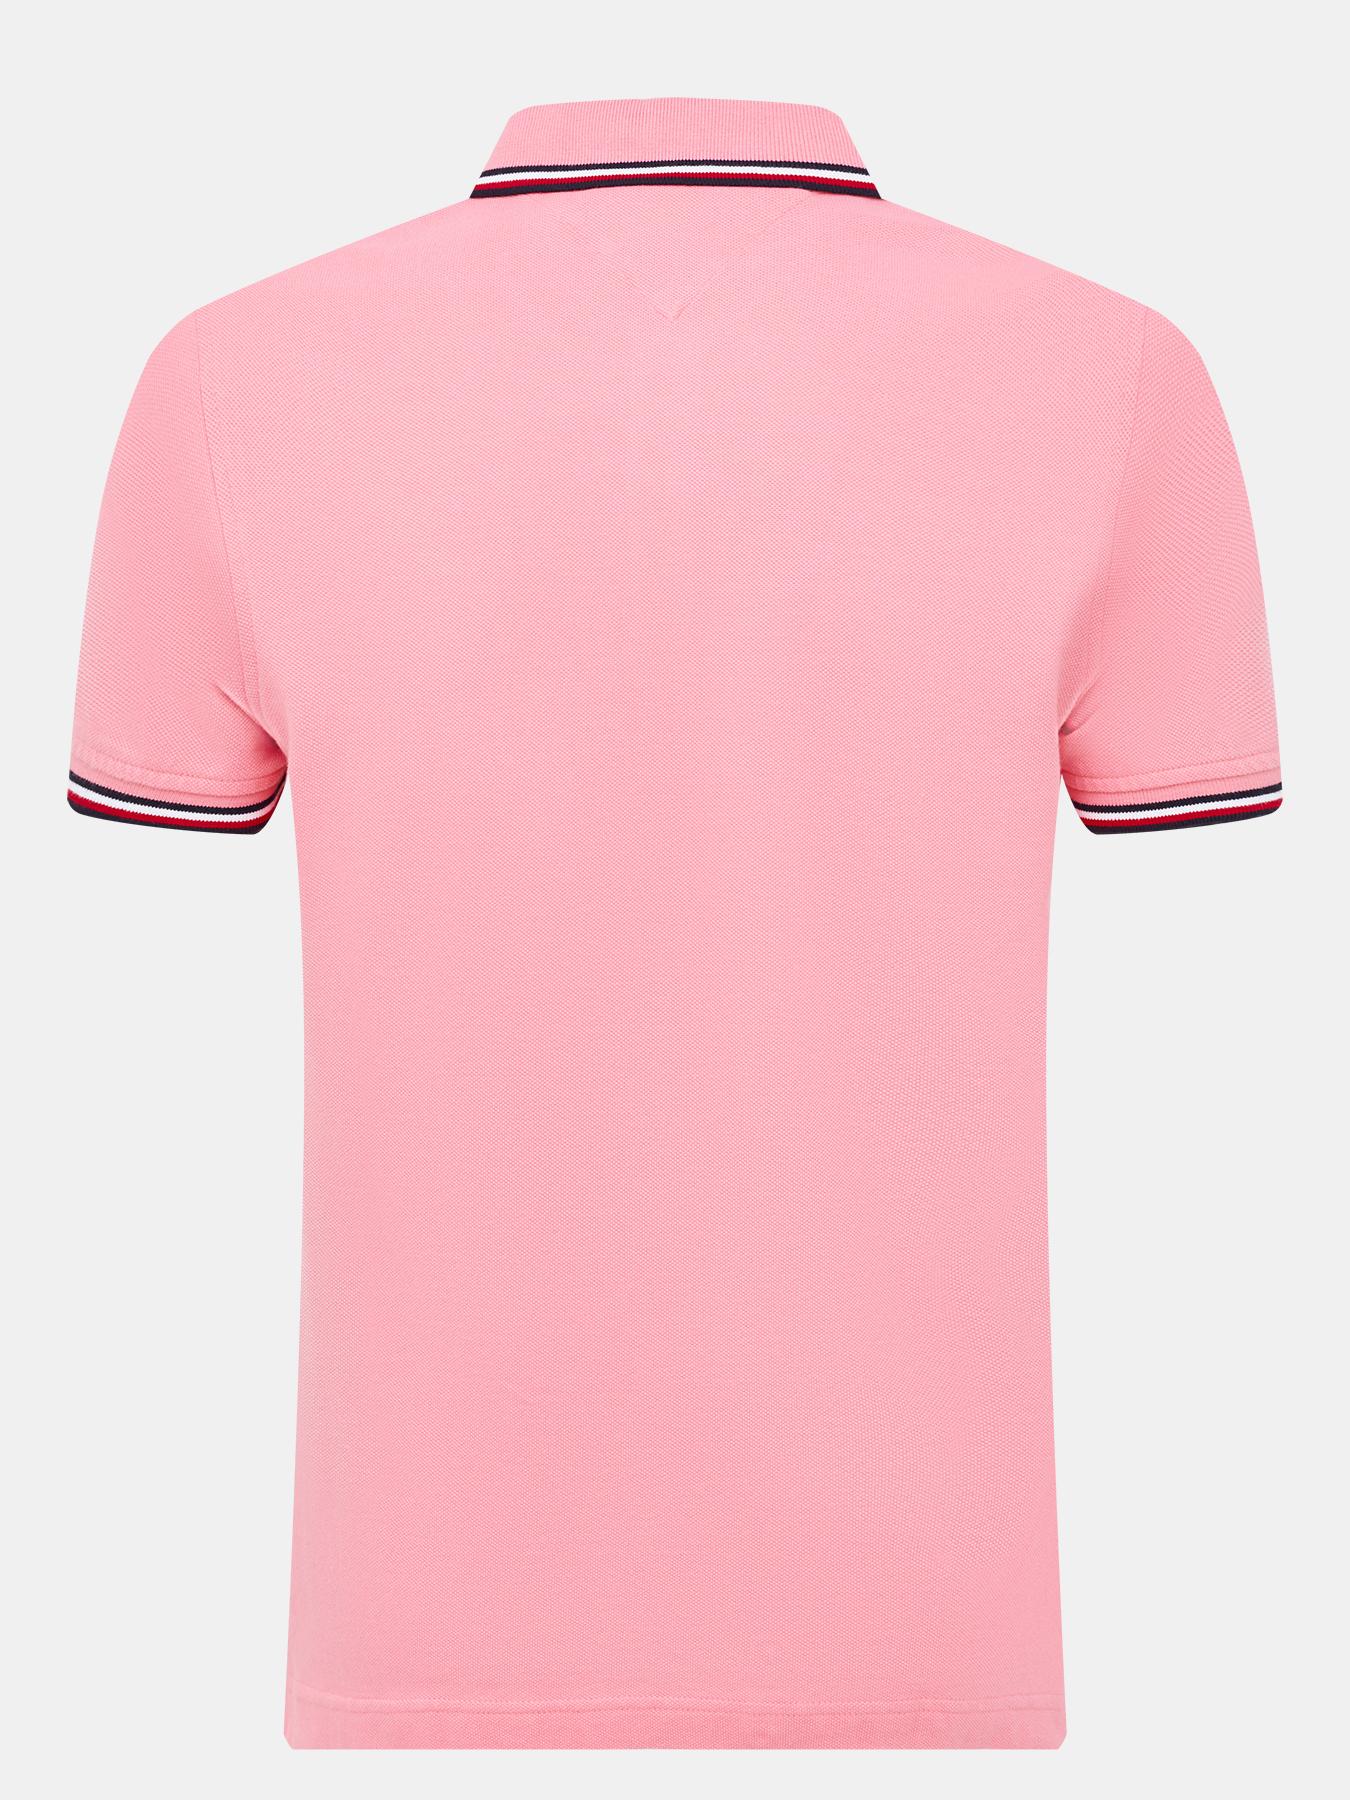 "цена на Рубашка с воротом ""поло"" Tommy Hilfiger Поло"